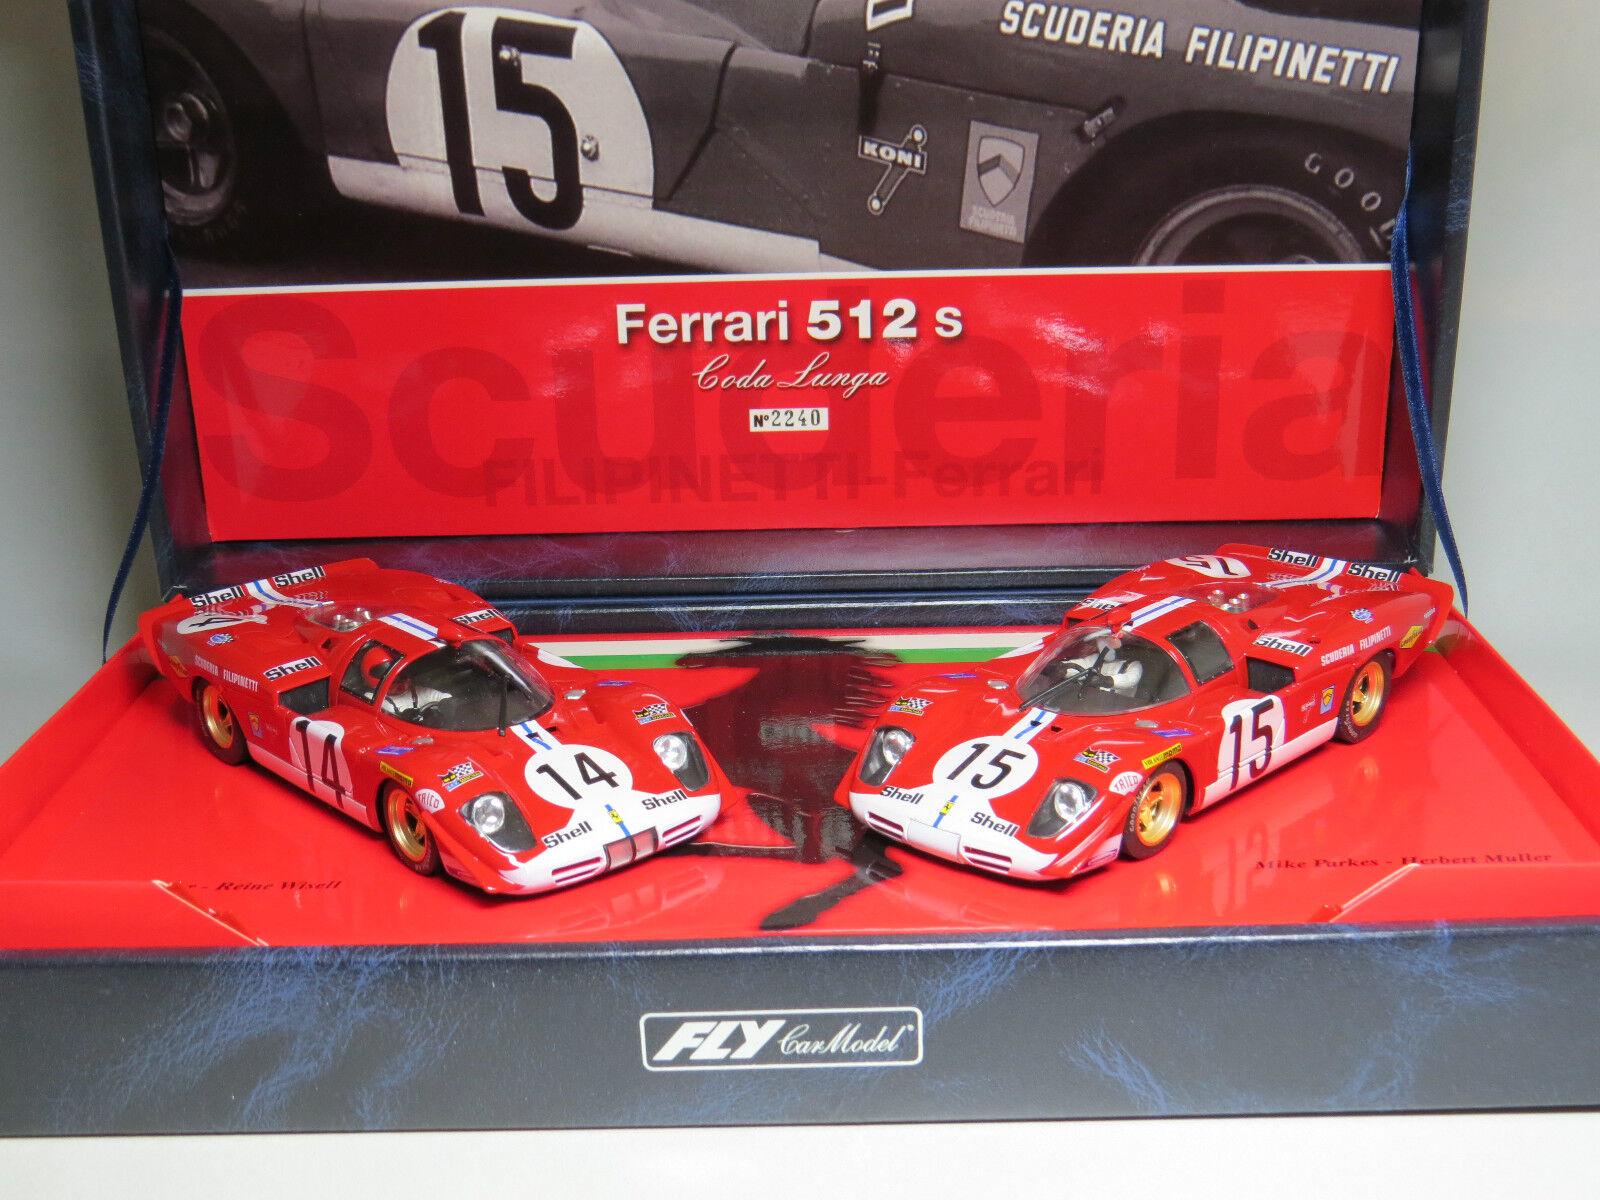 Slot racing FLY-carmodel Filipinetti-Ferrari 512S Le mans 1970  Coda Lunga